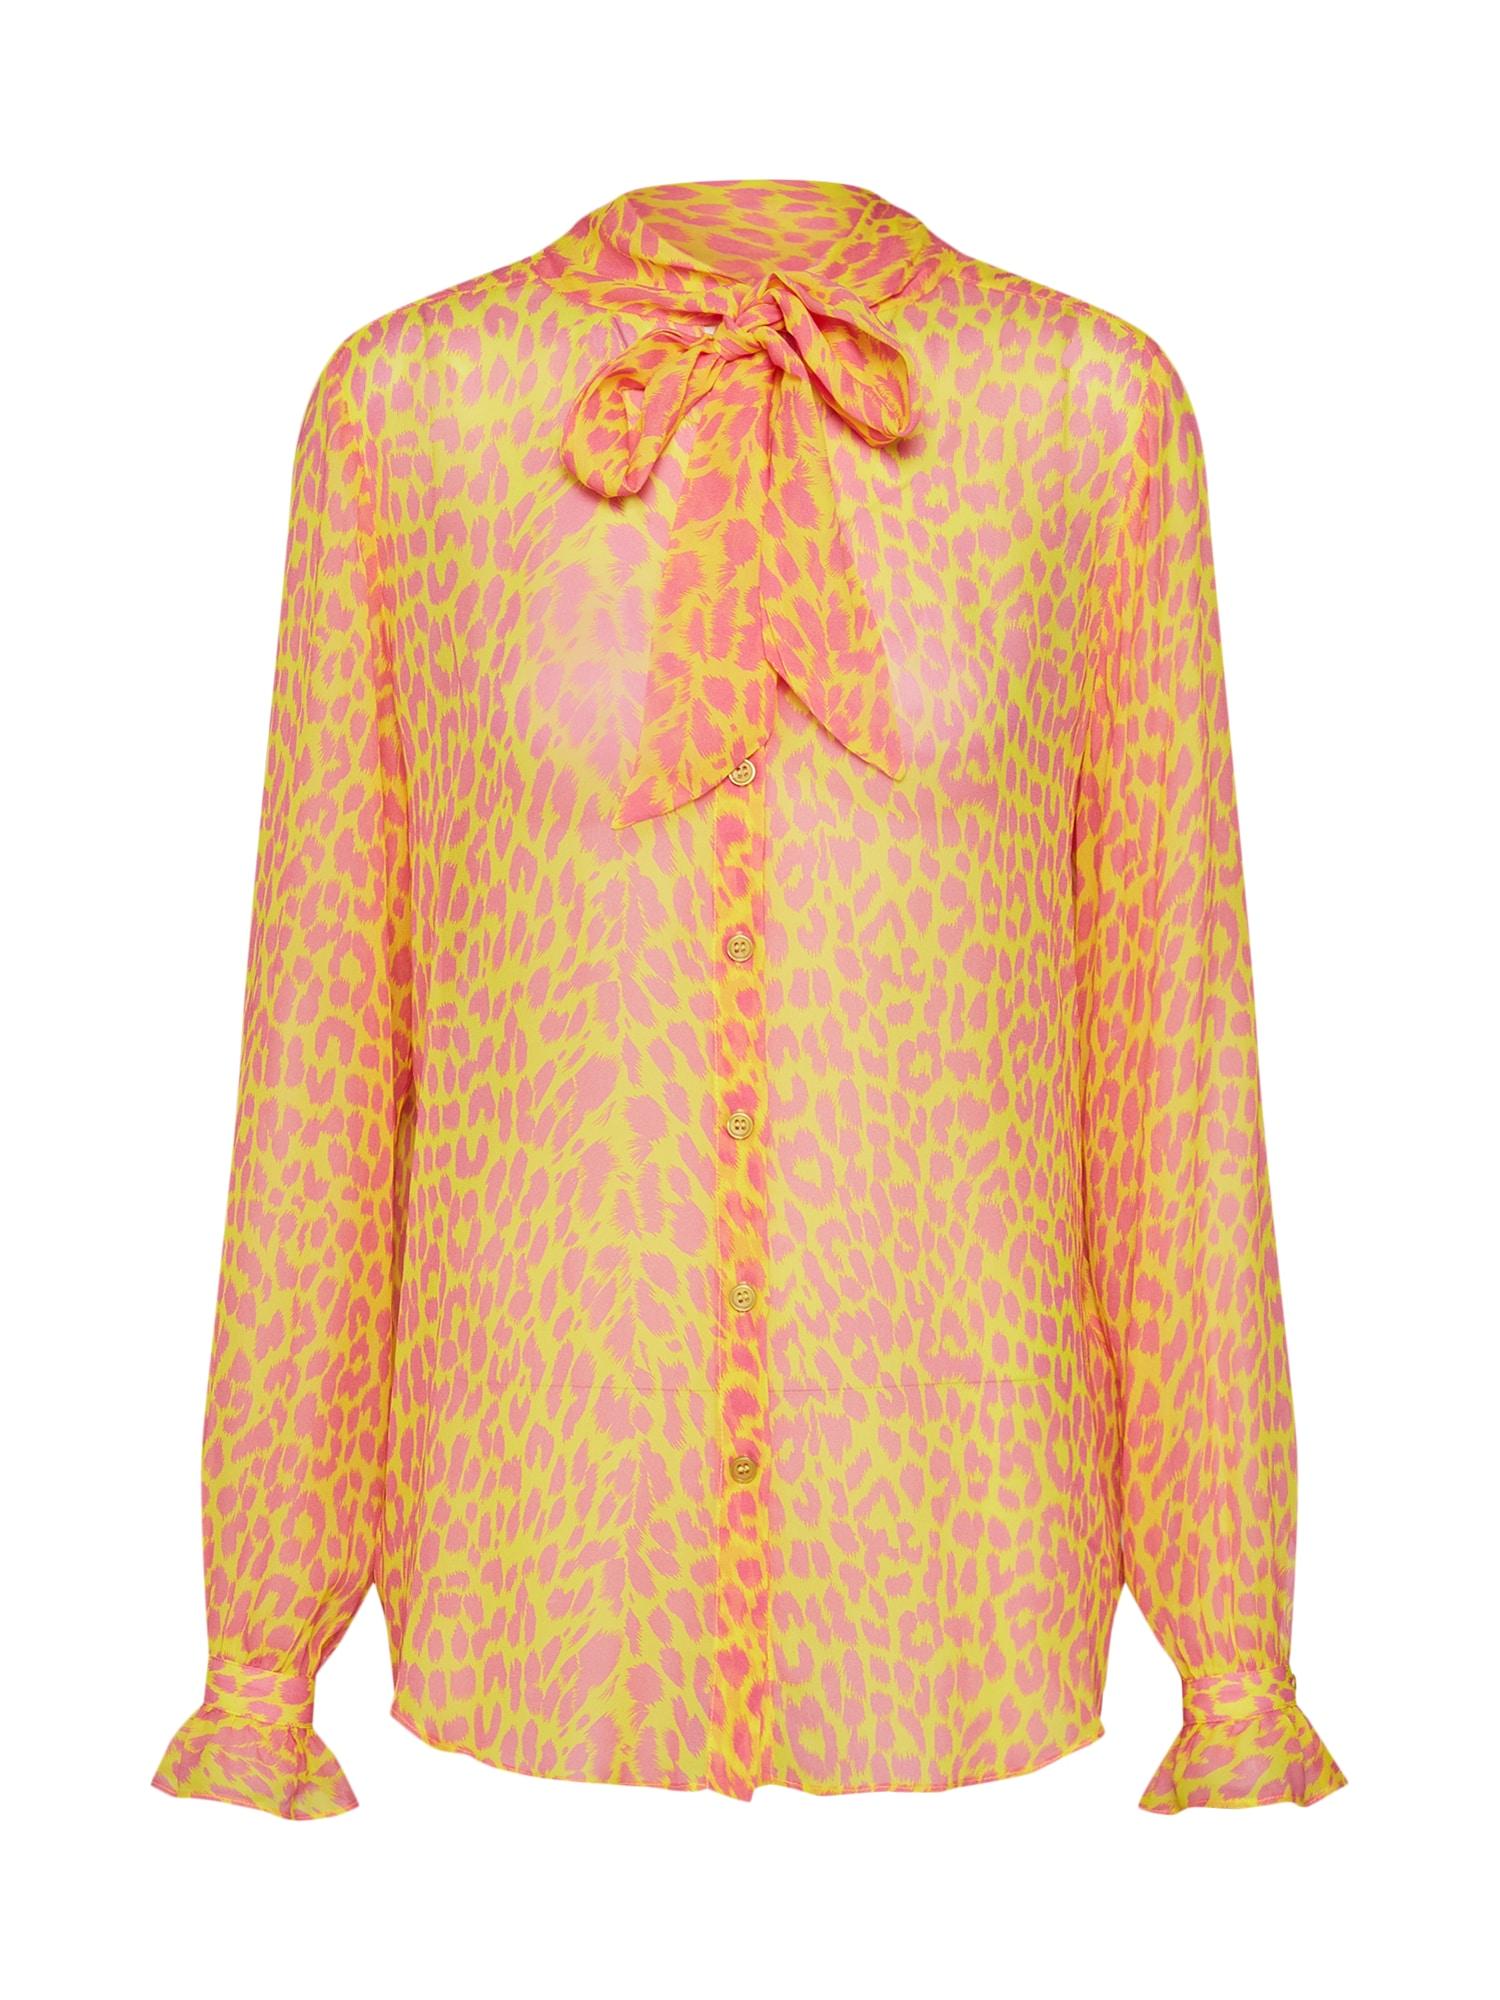 Halenka Estelle oranžová pink SAND COPENHAGEN